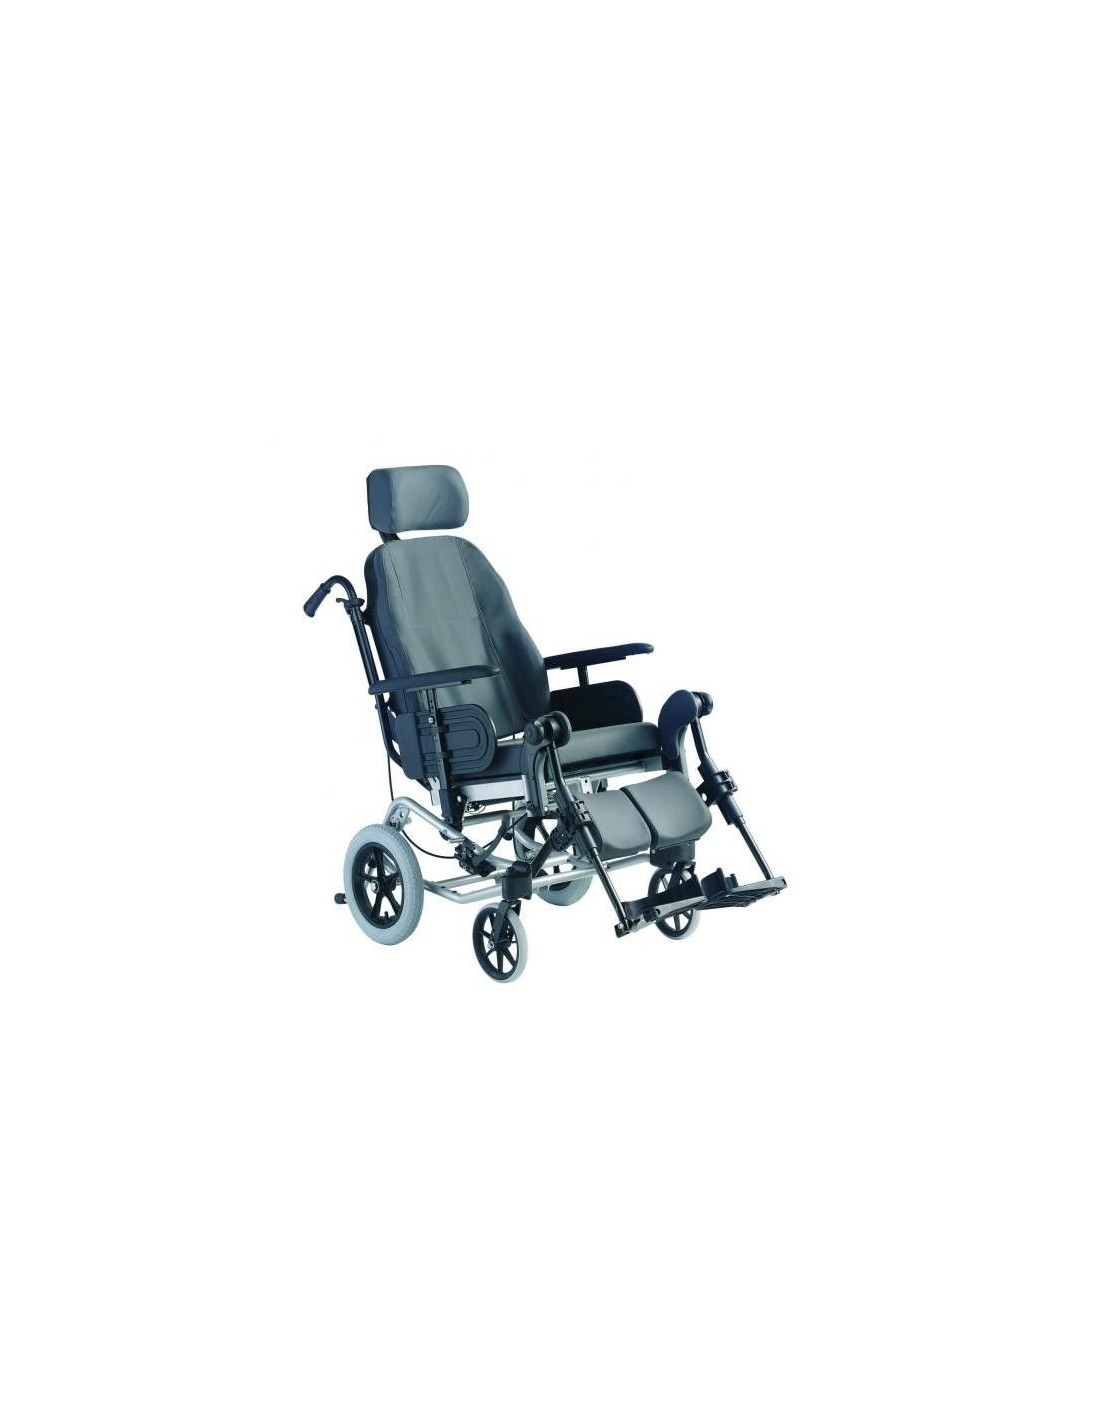 silla de ruedas rea clematis invacare